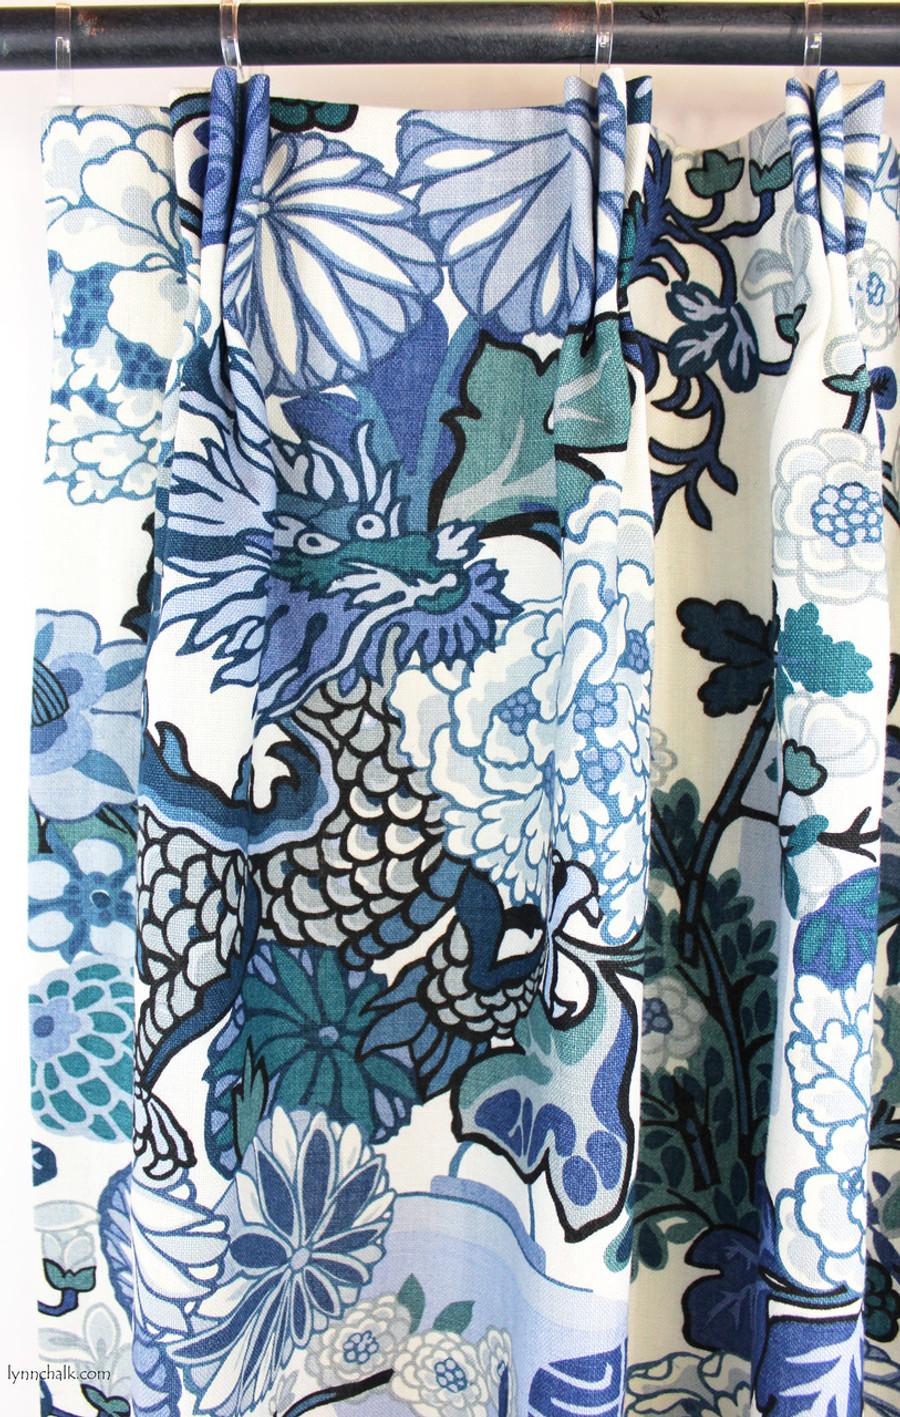 Custom Pleated Drapes by Lynn Chalk in Chiang Mai Dragon in China Blue